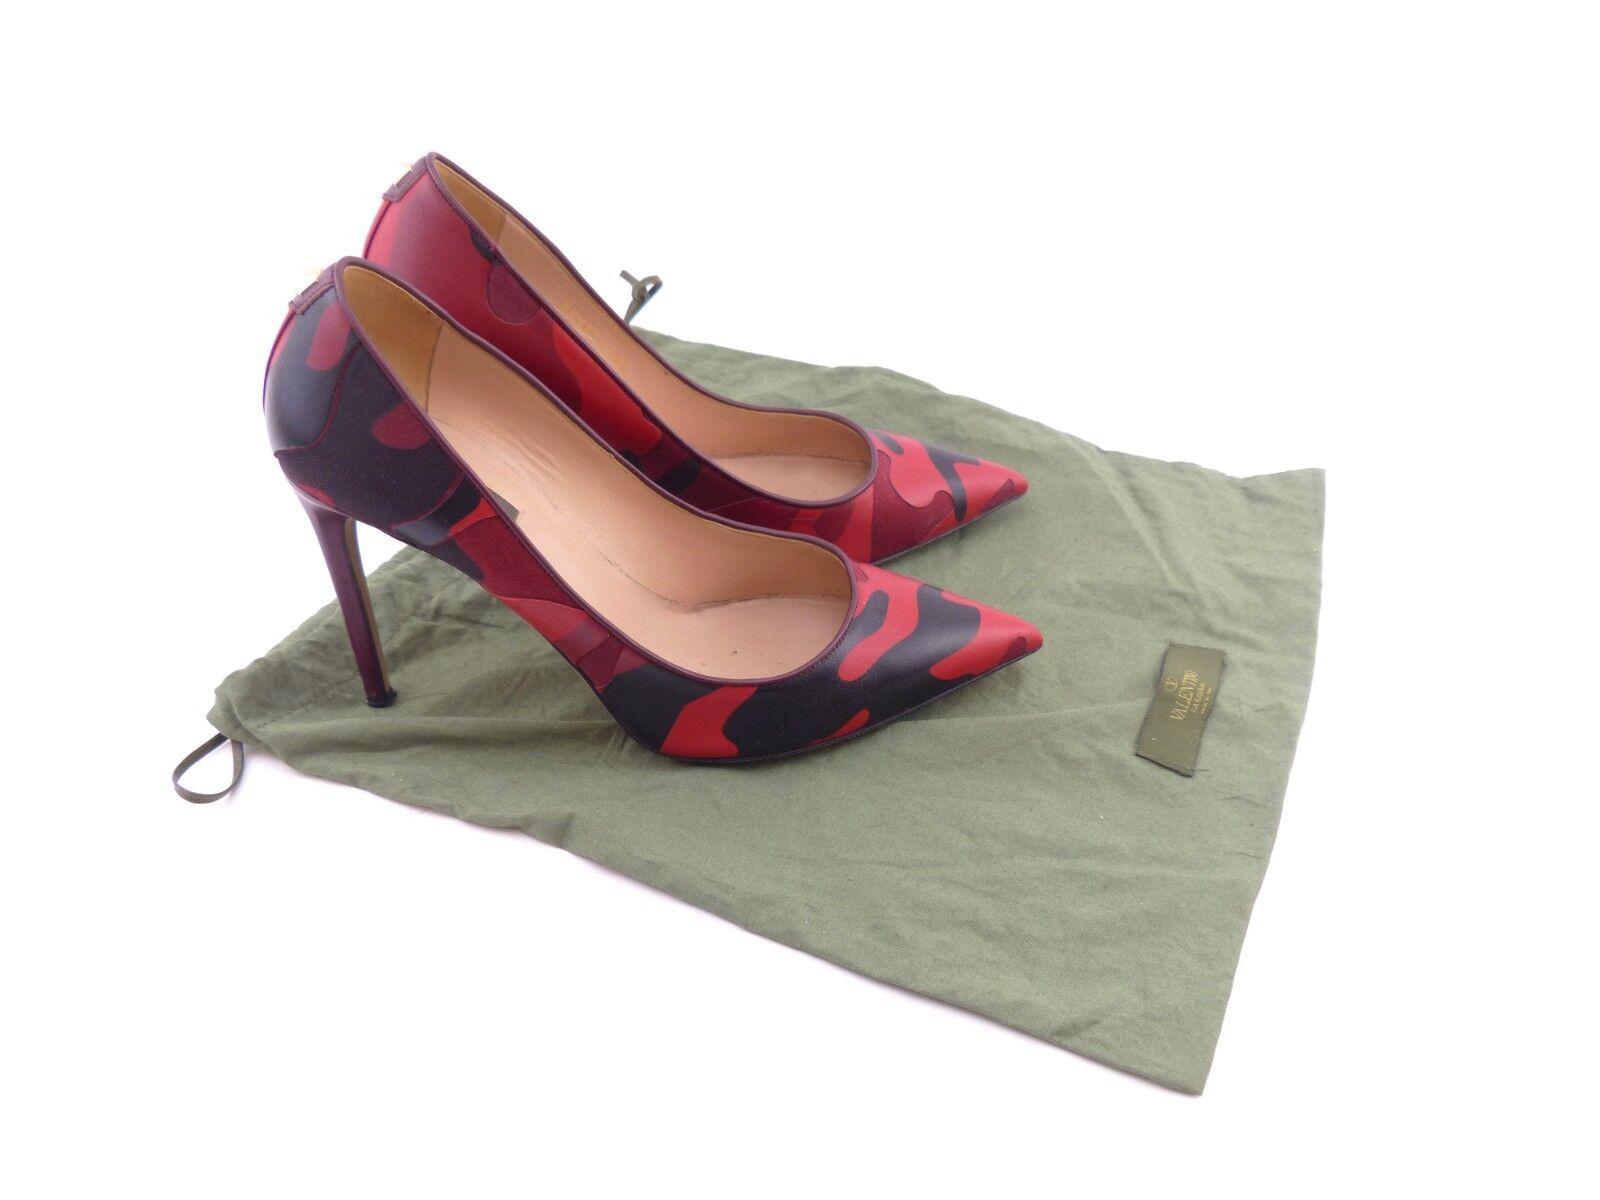 Valentino Valentino Valentino rouge & Noir Camouflage-Imprimé en cuir  uk 6.5 EU 39.5 US 9.5 a73bd8